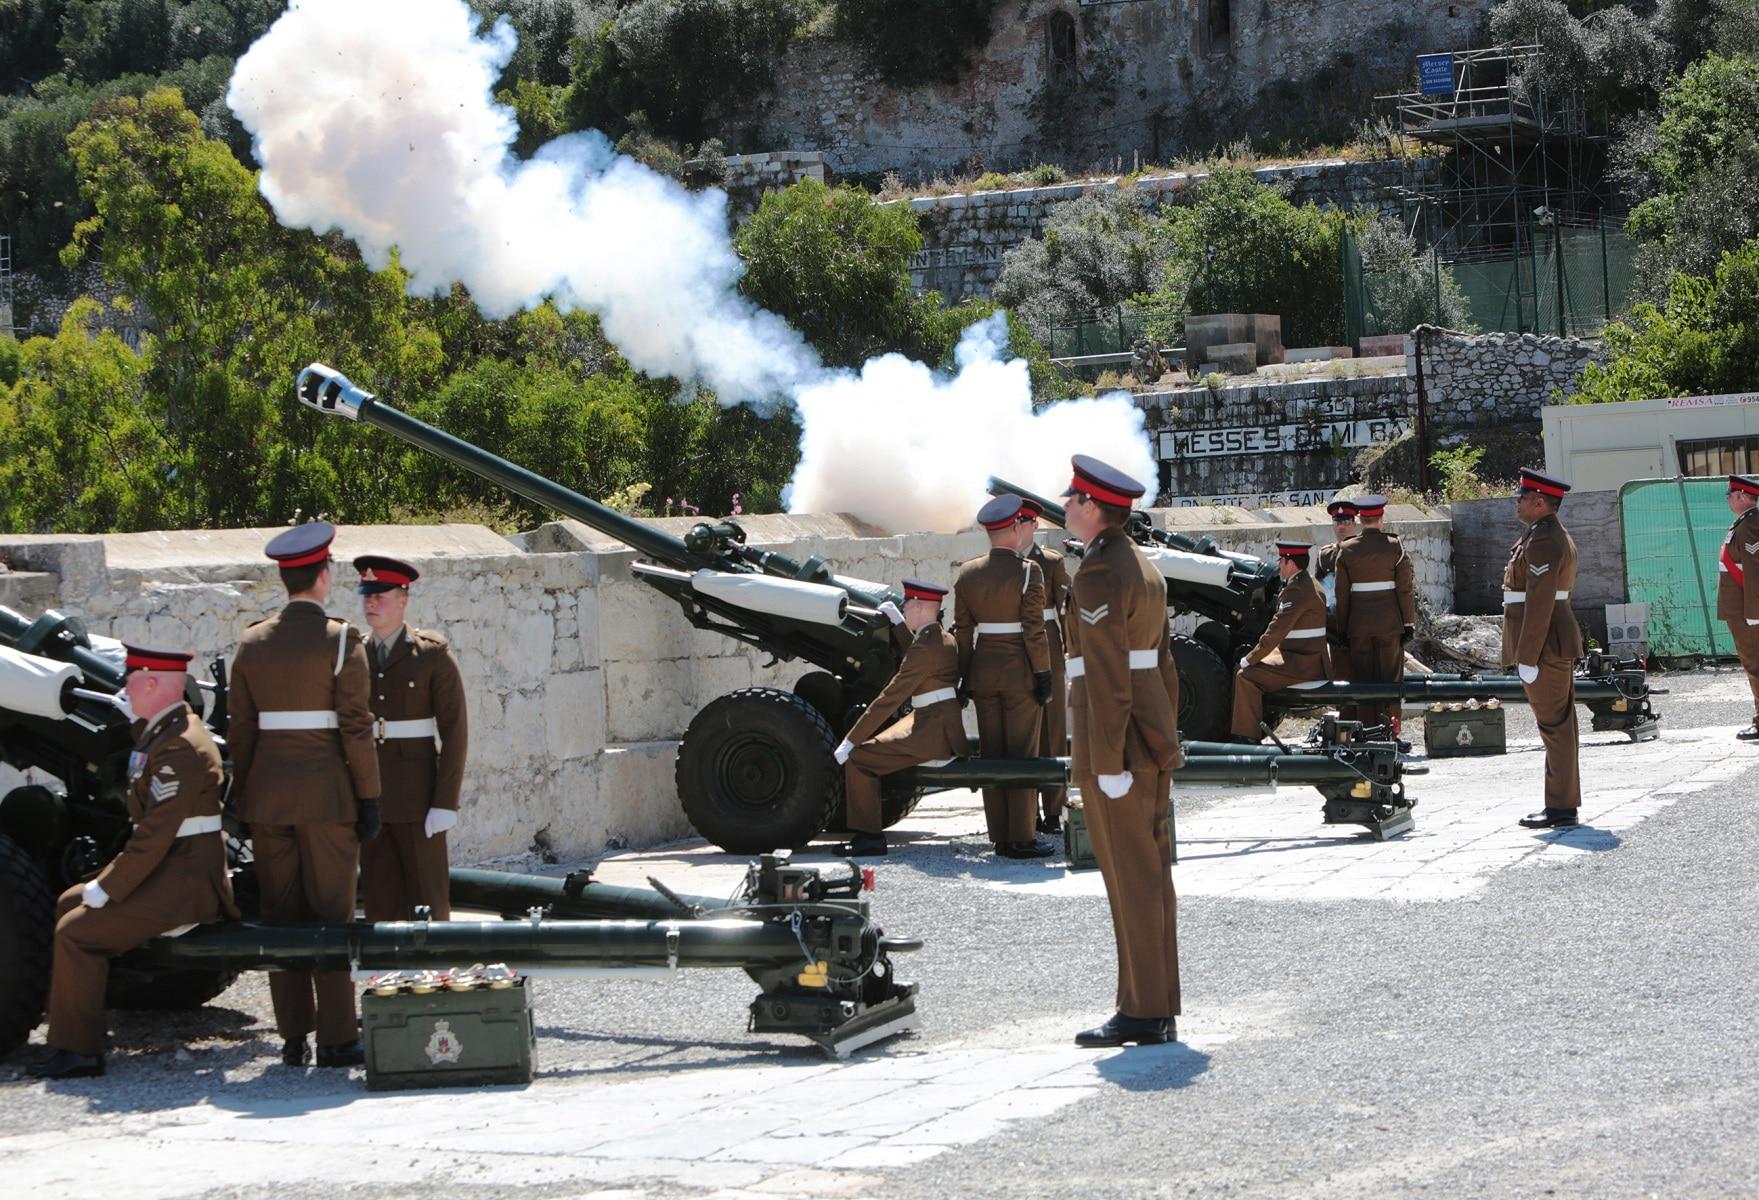 2-jun-2016-salvas-en-gibraltar-honor-al-aniversario-de-coronacin-de-la-reina_27417177485_o